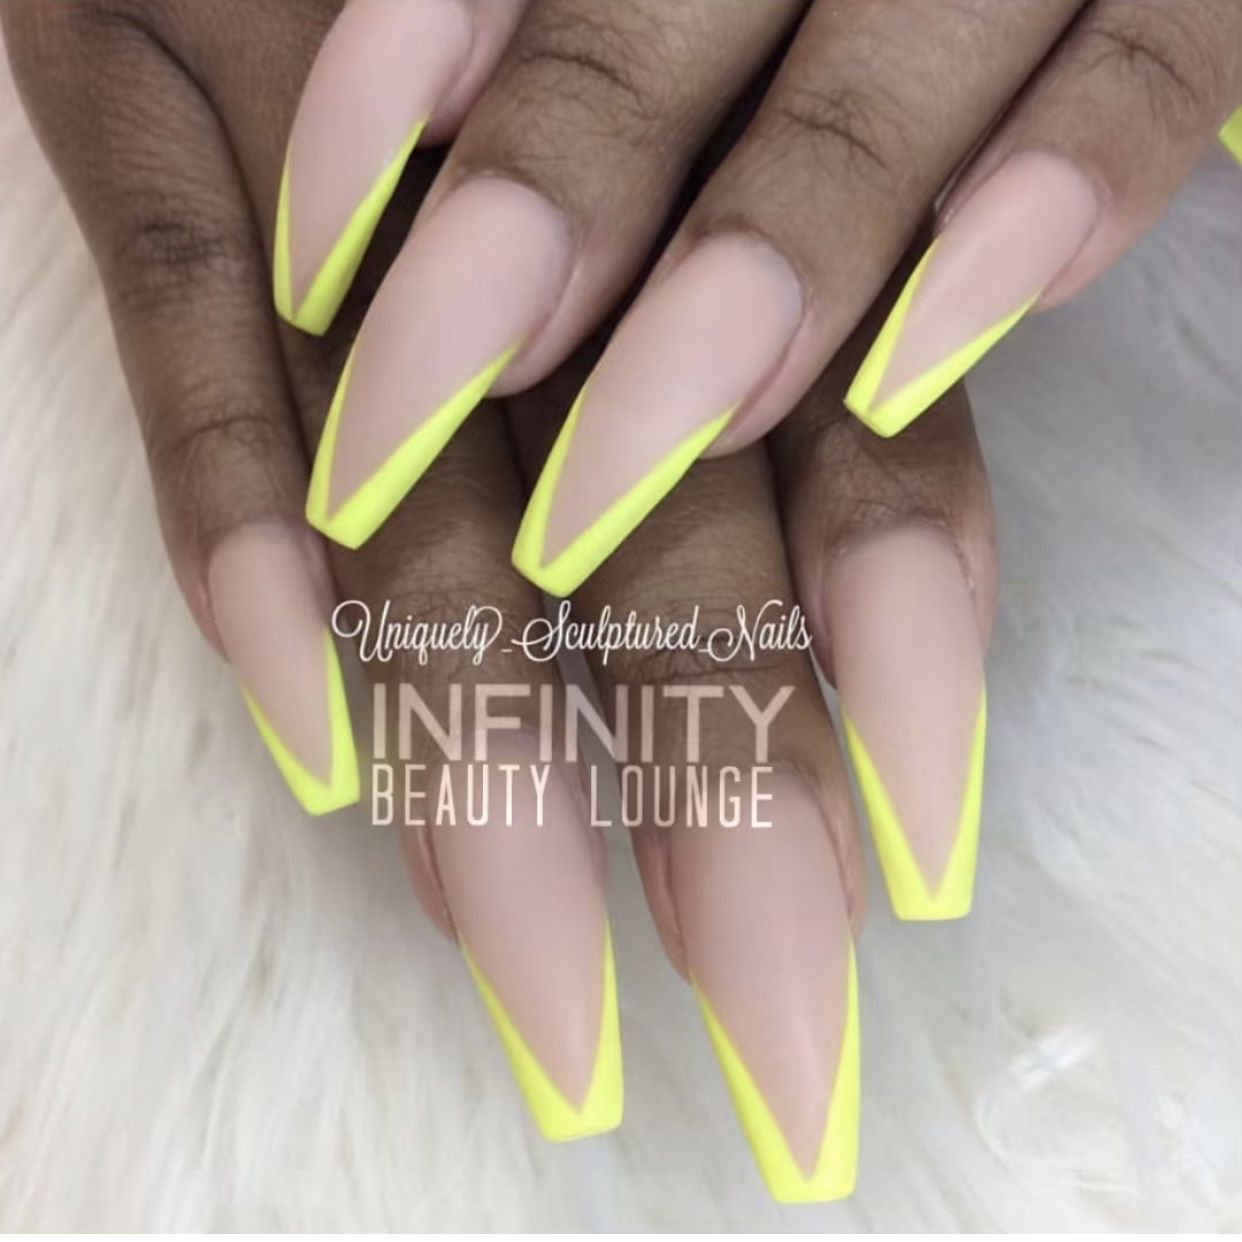 Infinity Beauty Lounge Jax Hair And Nail Salon Beauty Lounge Beauty